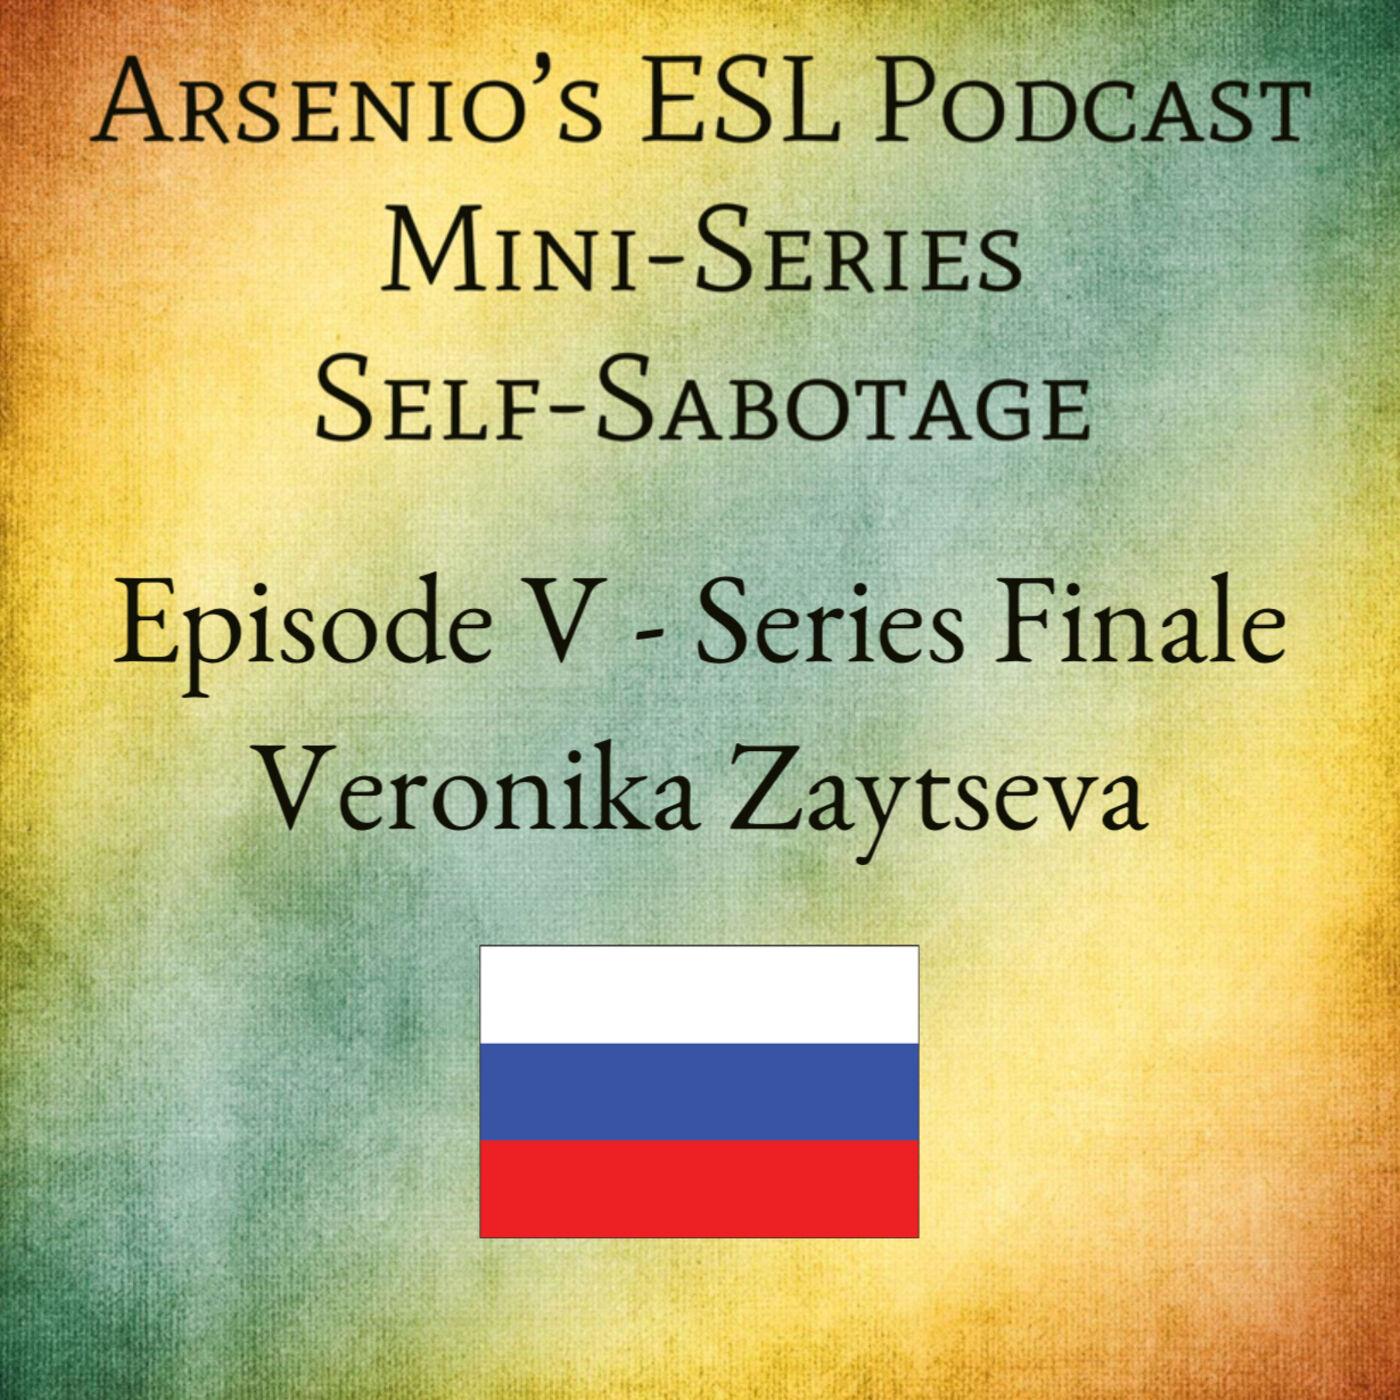 Arsenio's ESL Podcast: International Guest Speaker - Self-Sabotage Series with Veronika